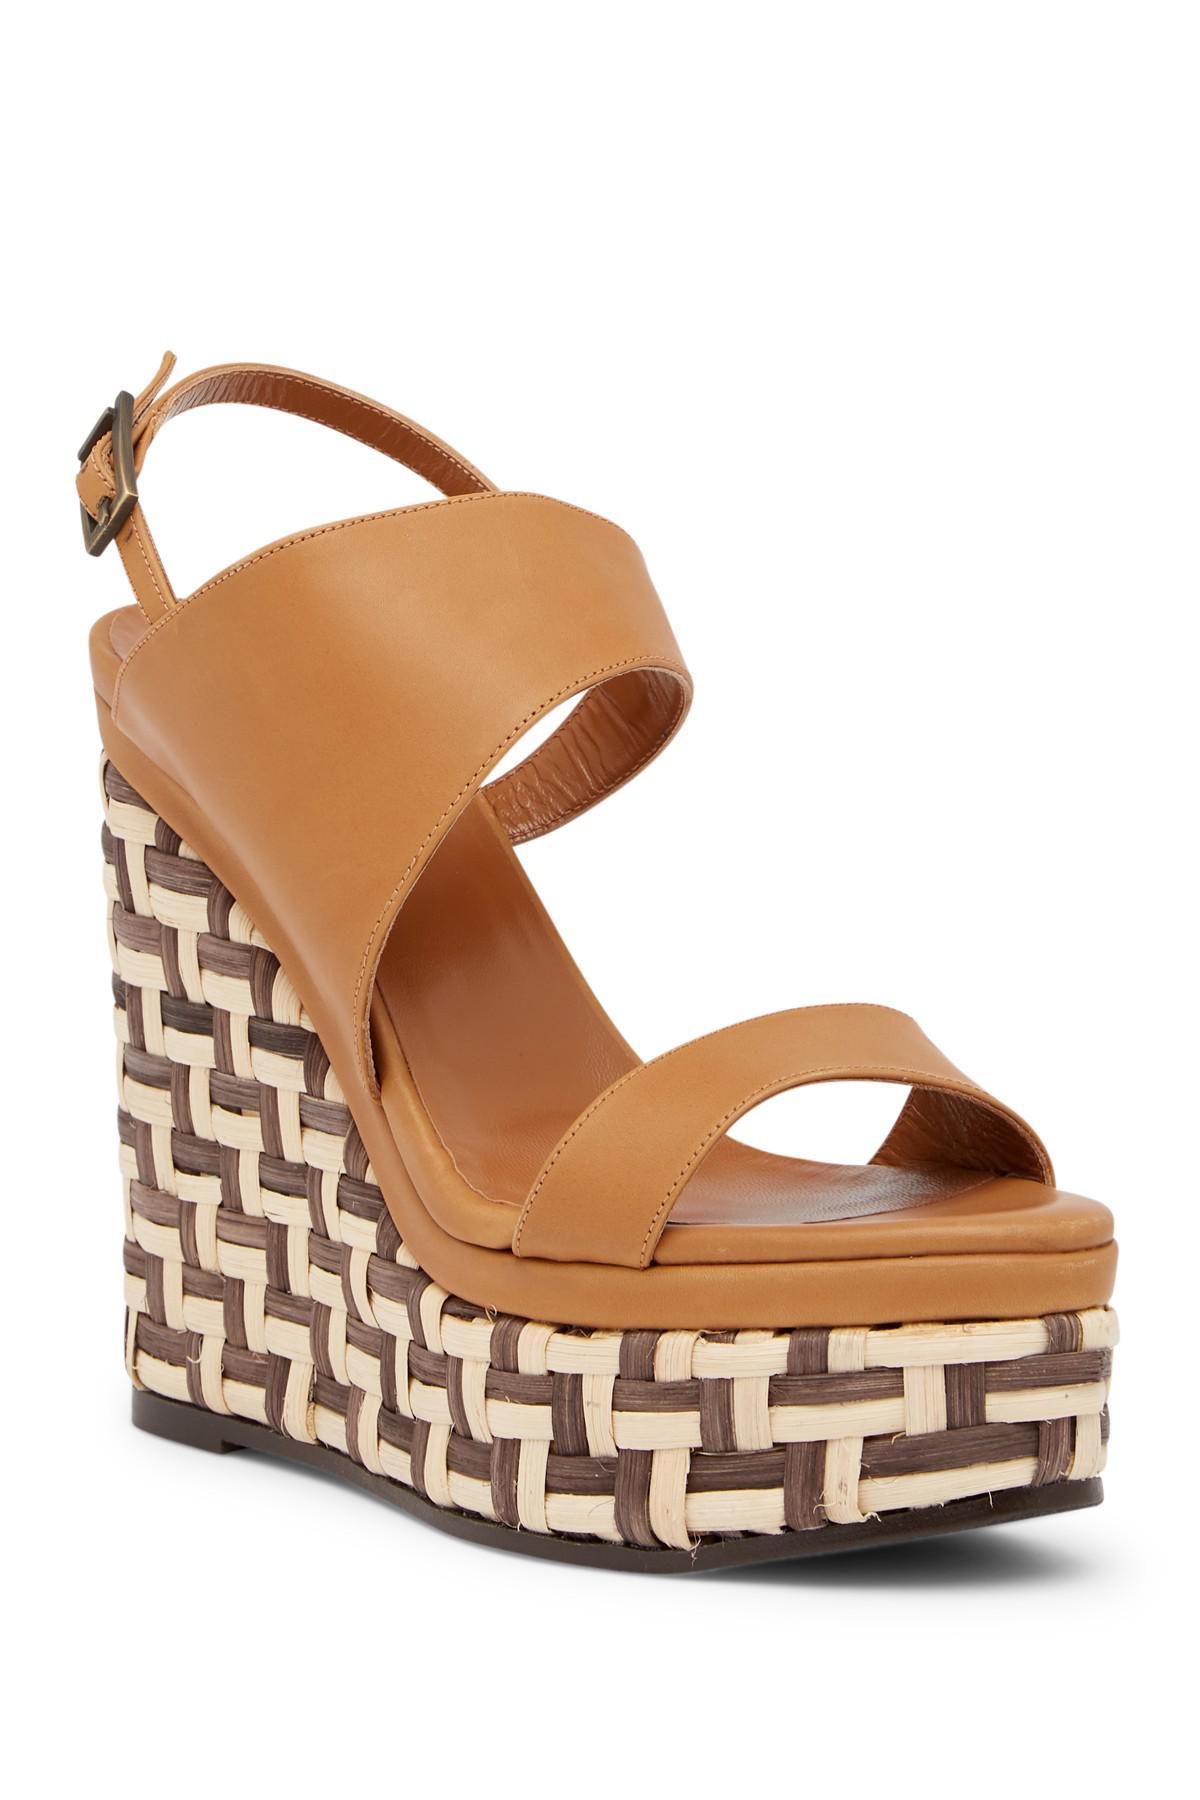 Aquatalia Carmela Woven Platform Heel Leather Sandal c7qtaD0Di